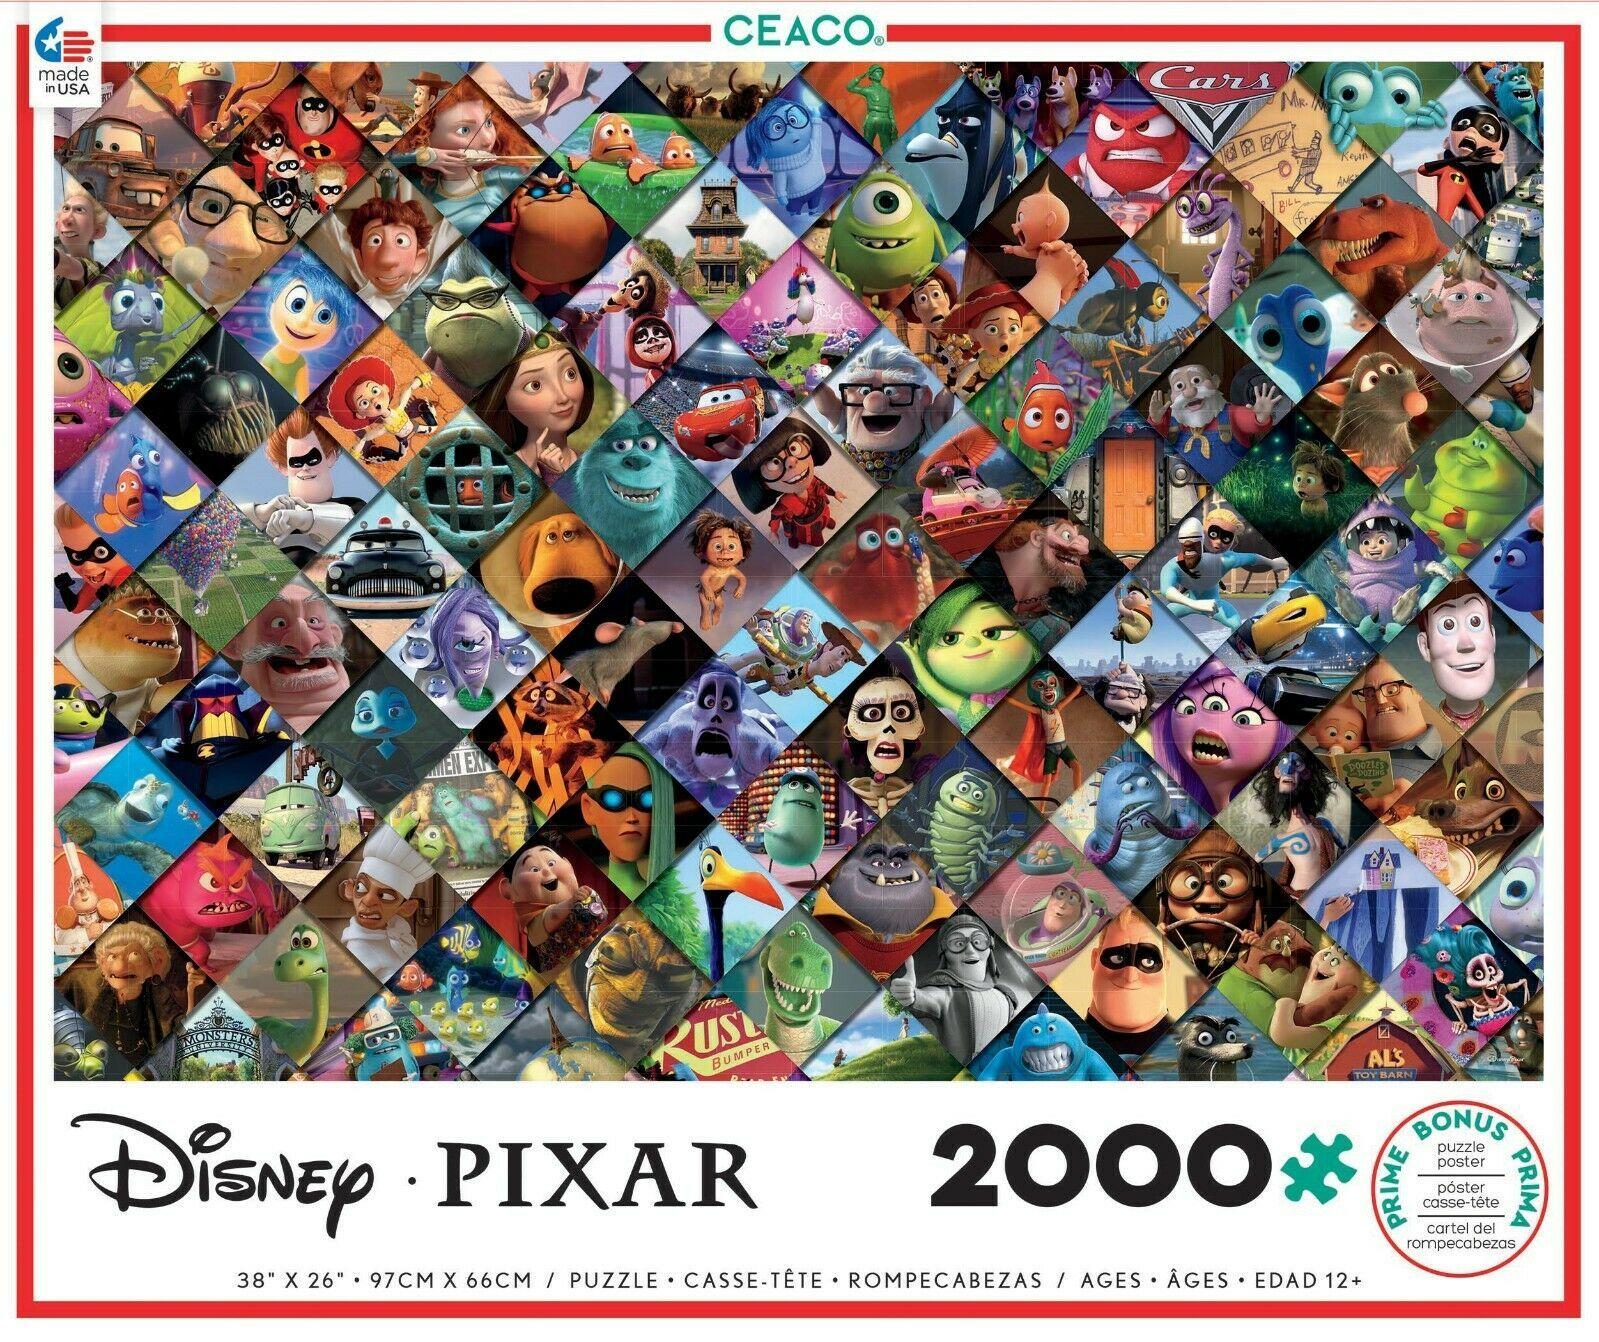 Ceaco Disney Pixar Clips Jigsaw Puzzle w/ Bonus 2000 Pieces NEW - $28.68